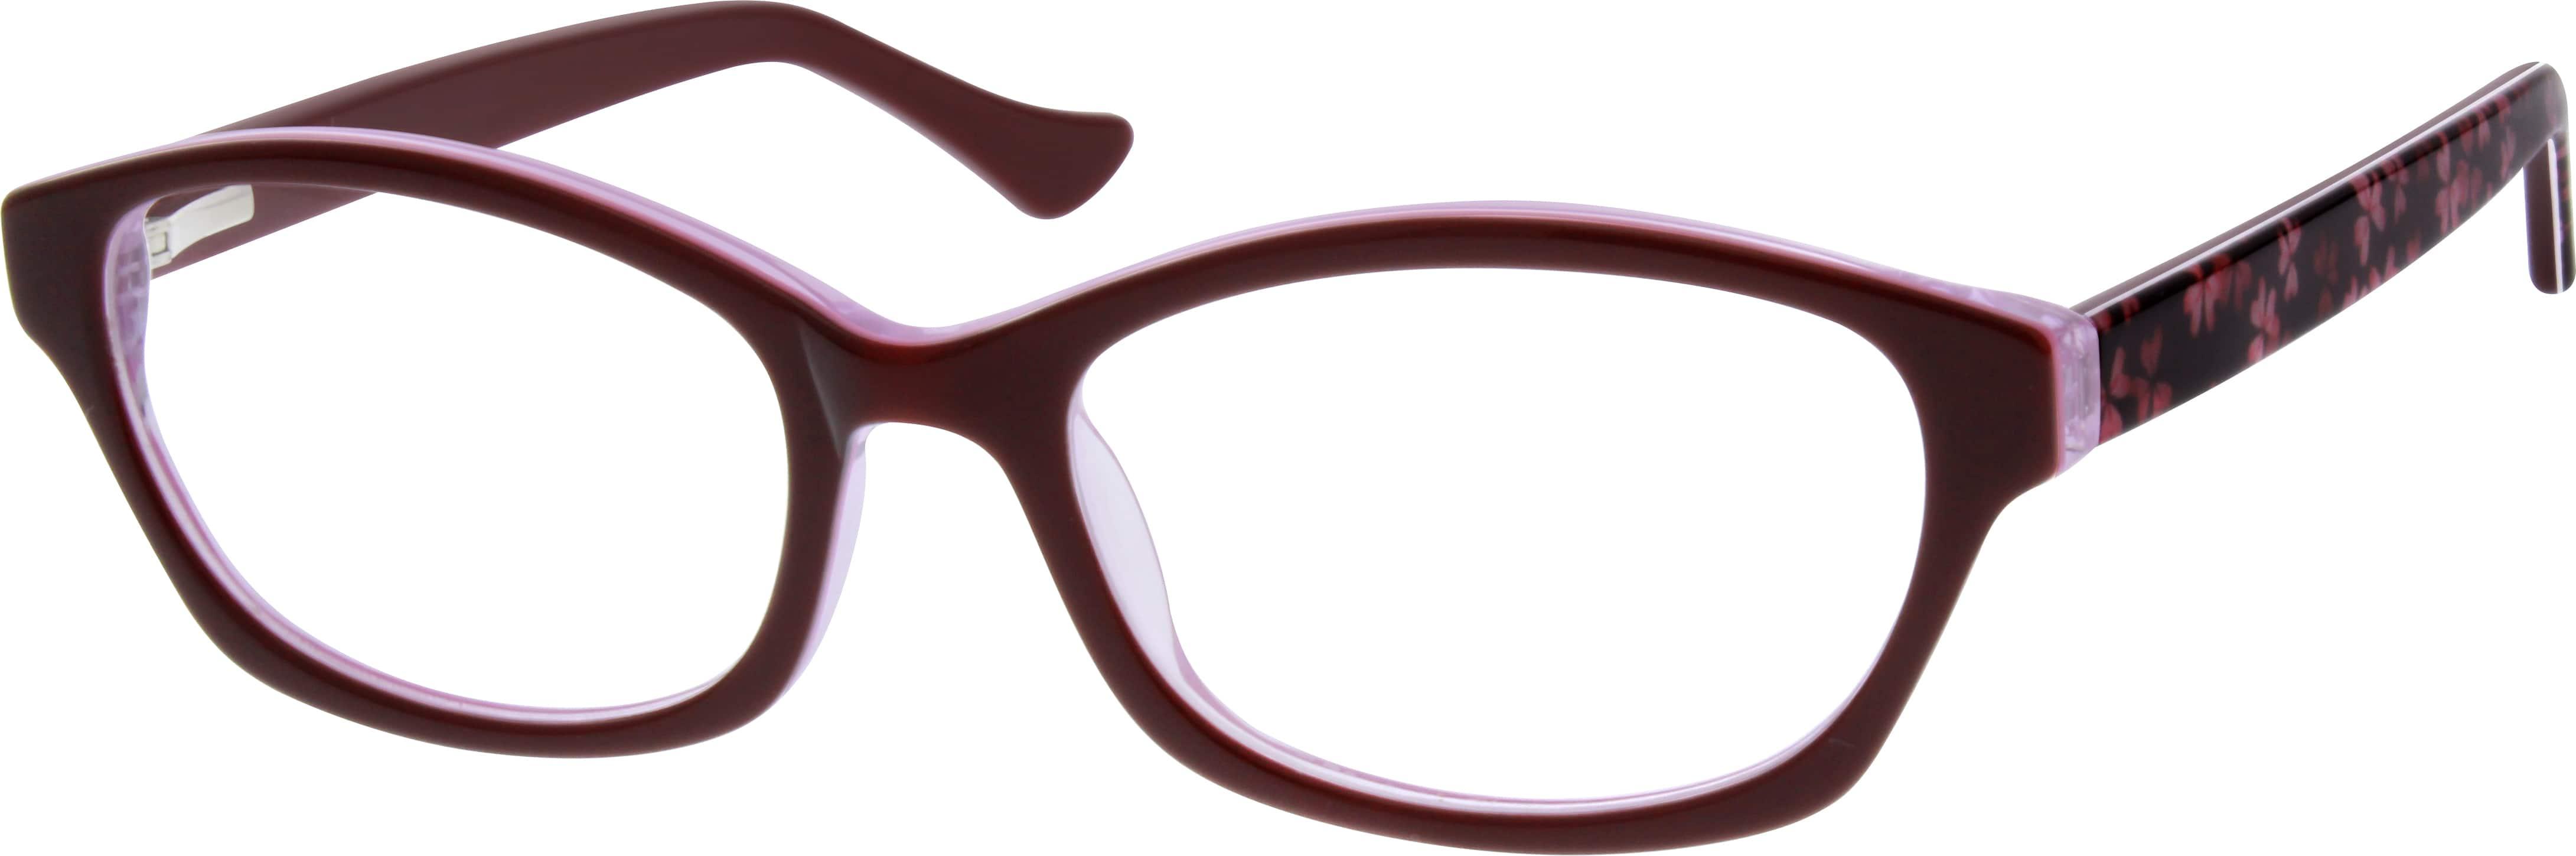 Purple Acetate Full Rim Frame With Spring Hinges 1827